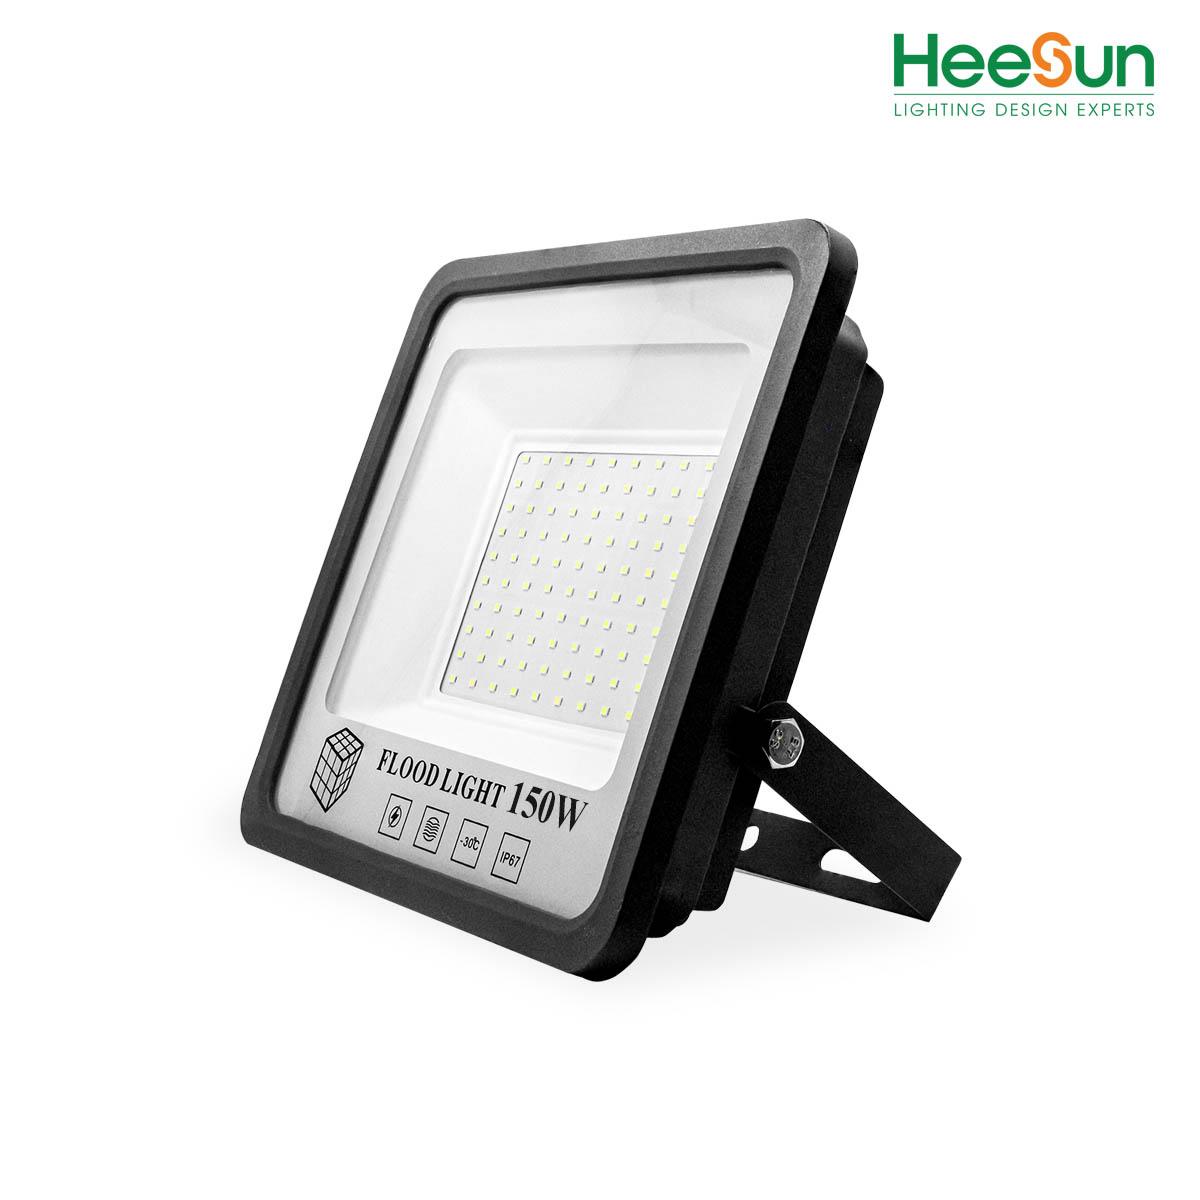 Đèn led pha HS-LP150-03 Heesun - HEESUN VIỆT NAM